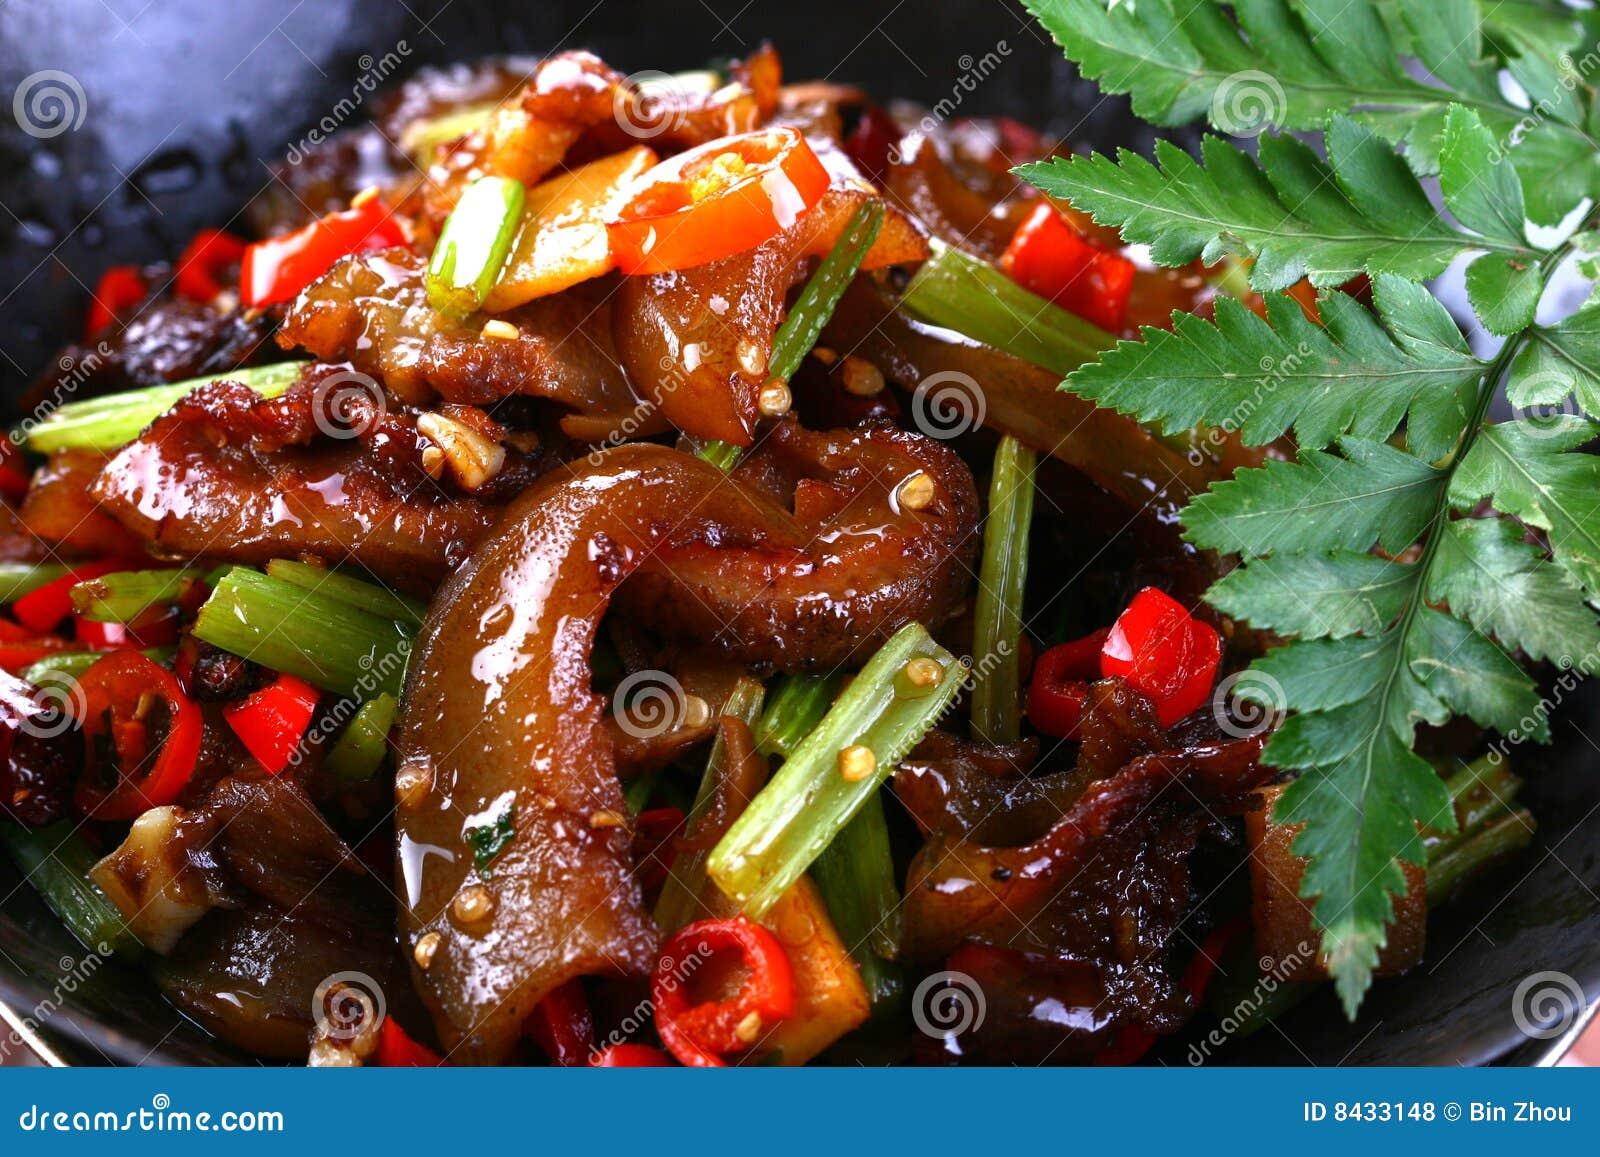 Fry asian food